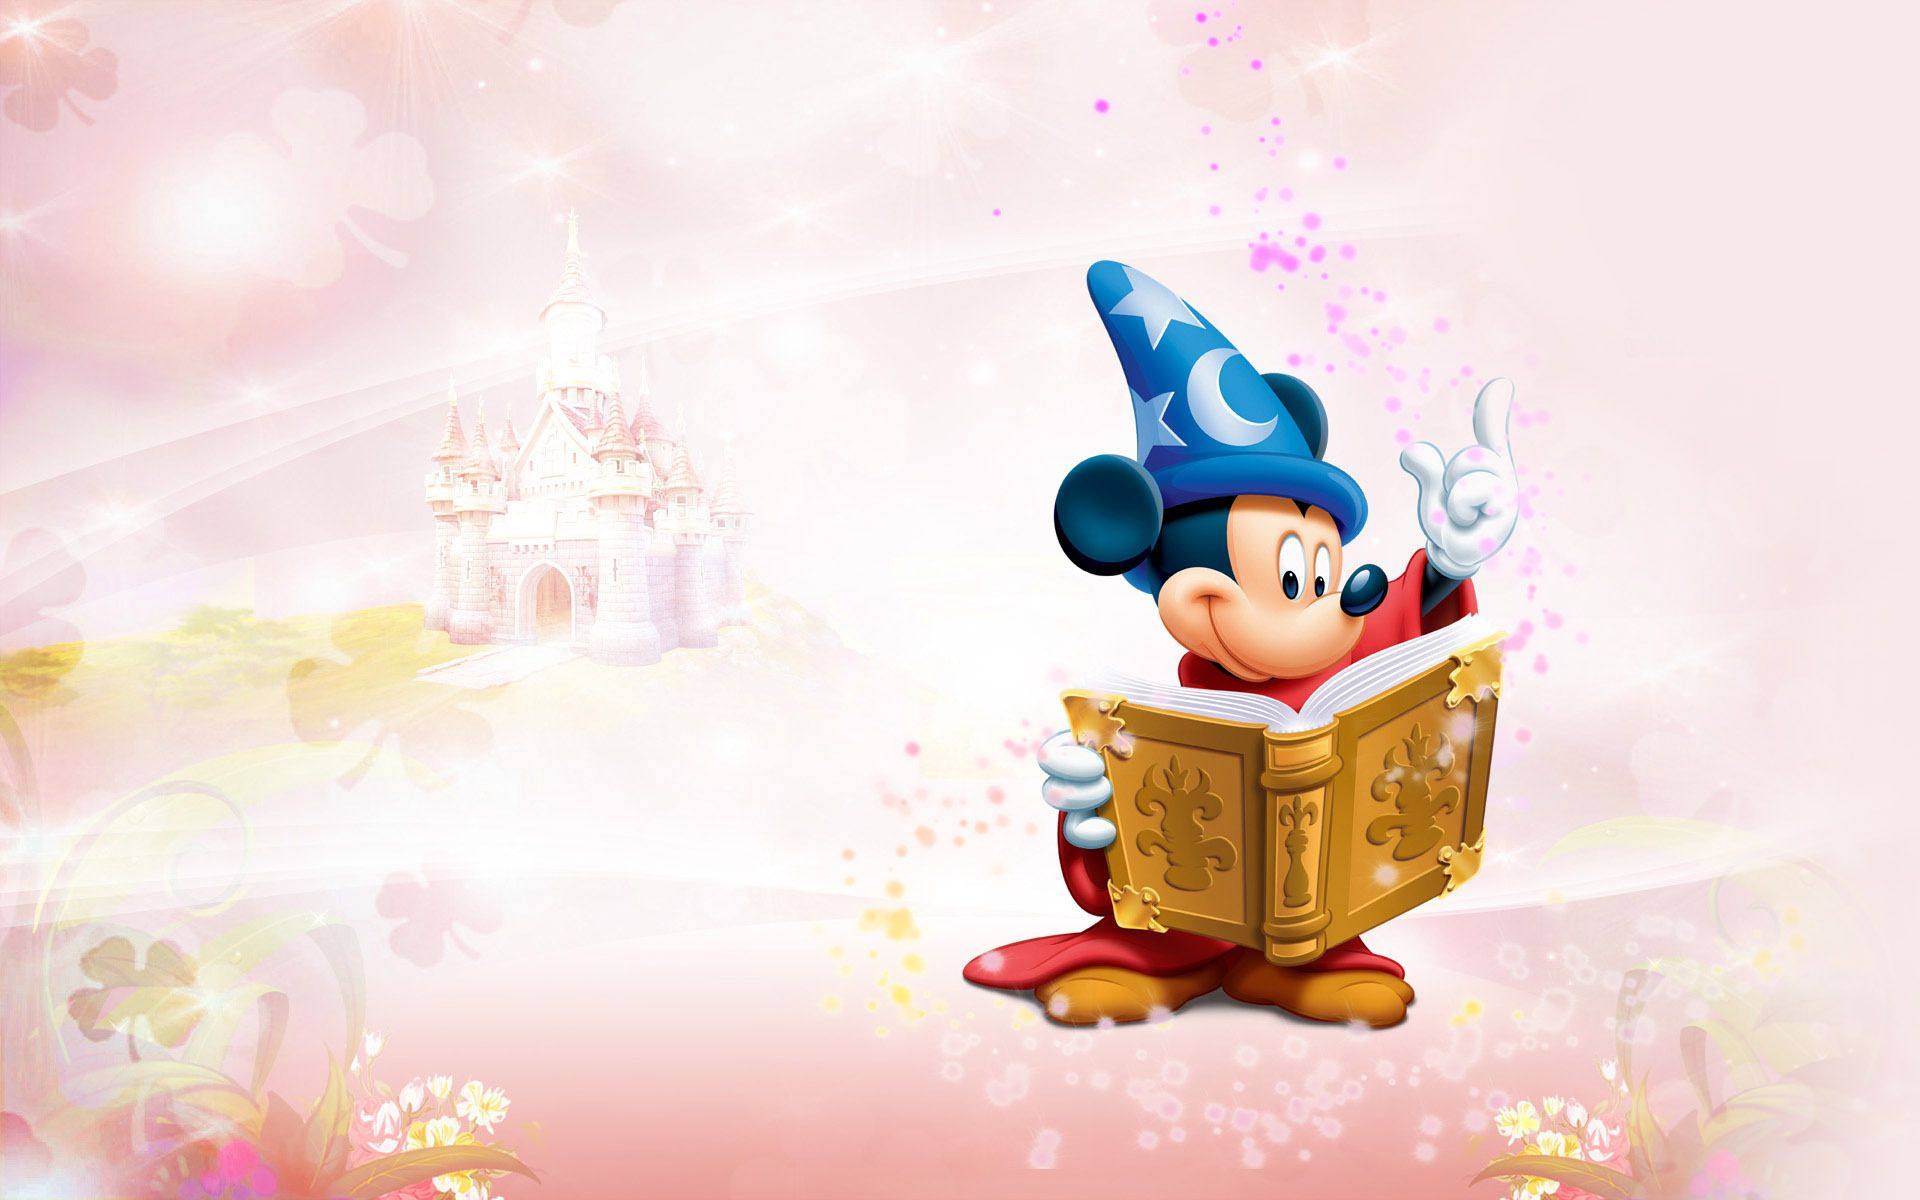 Ultra Hd K Mickey Mouse Wallpapers Hd Desktop Backgrounds